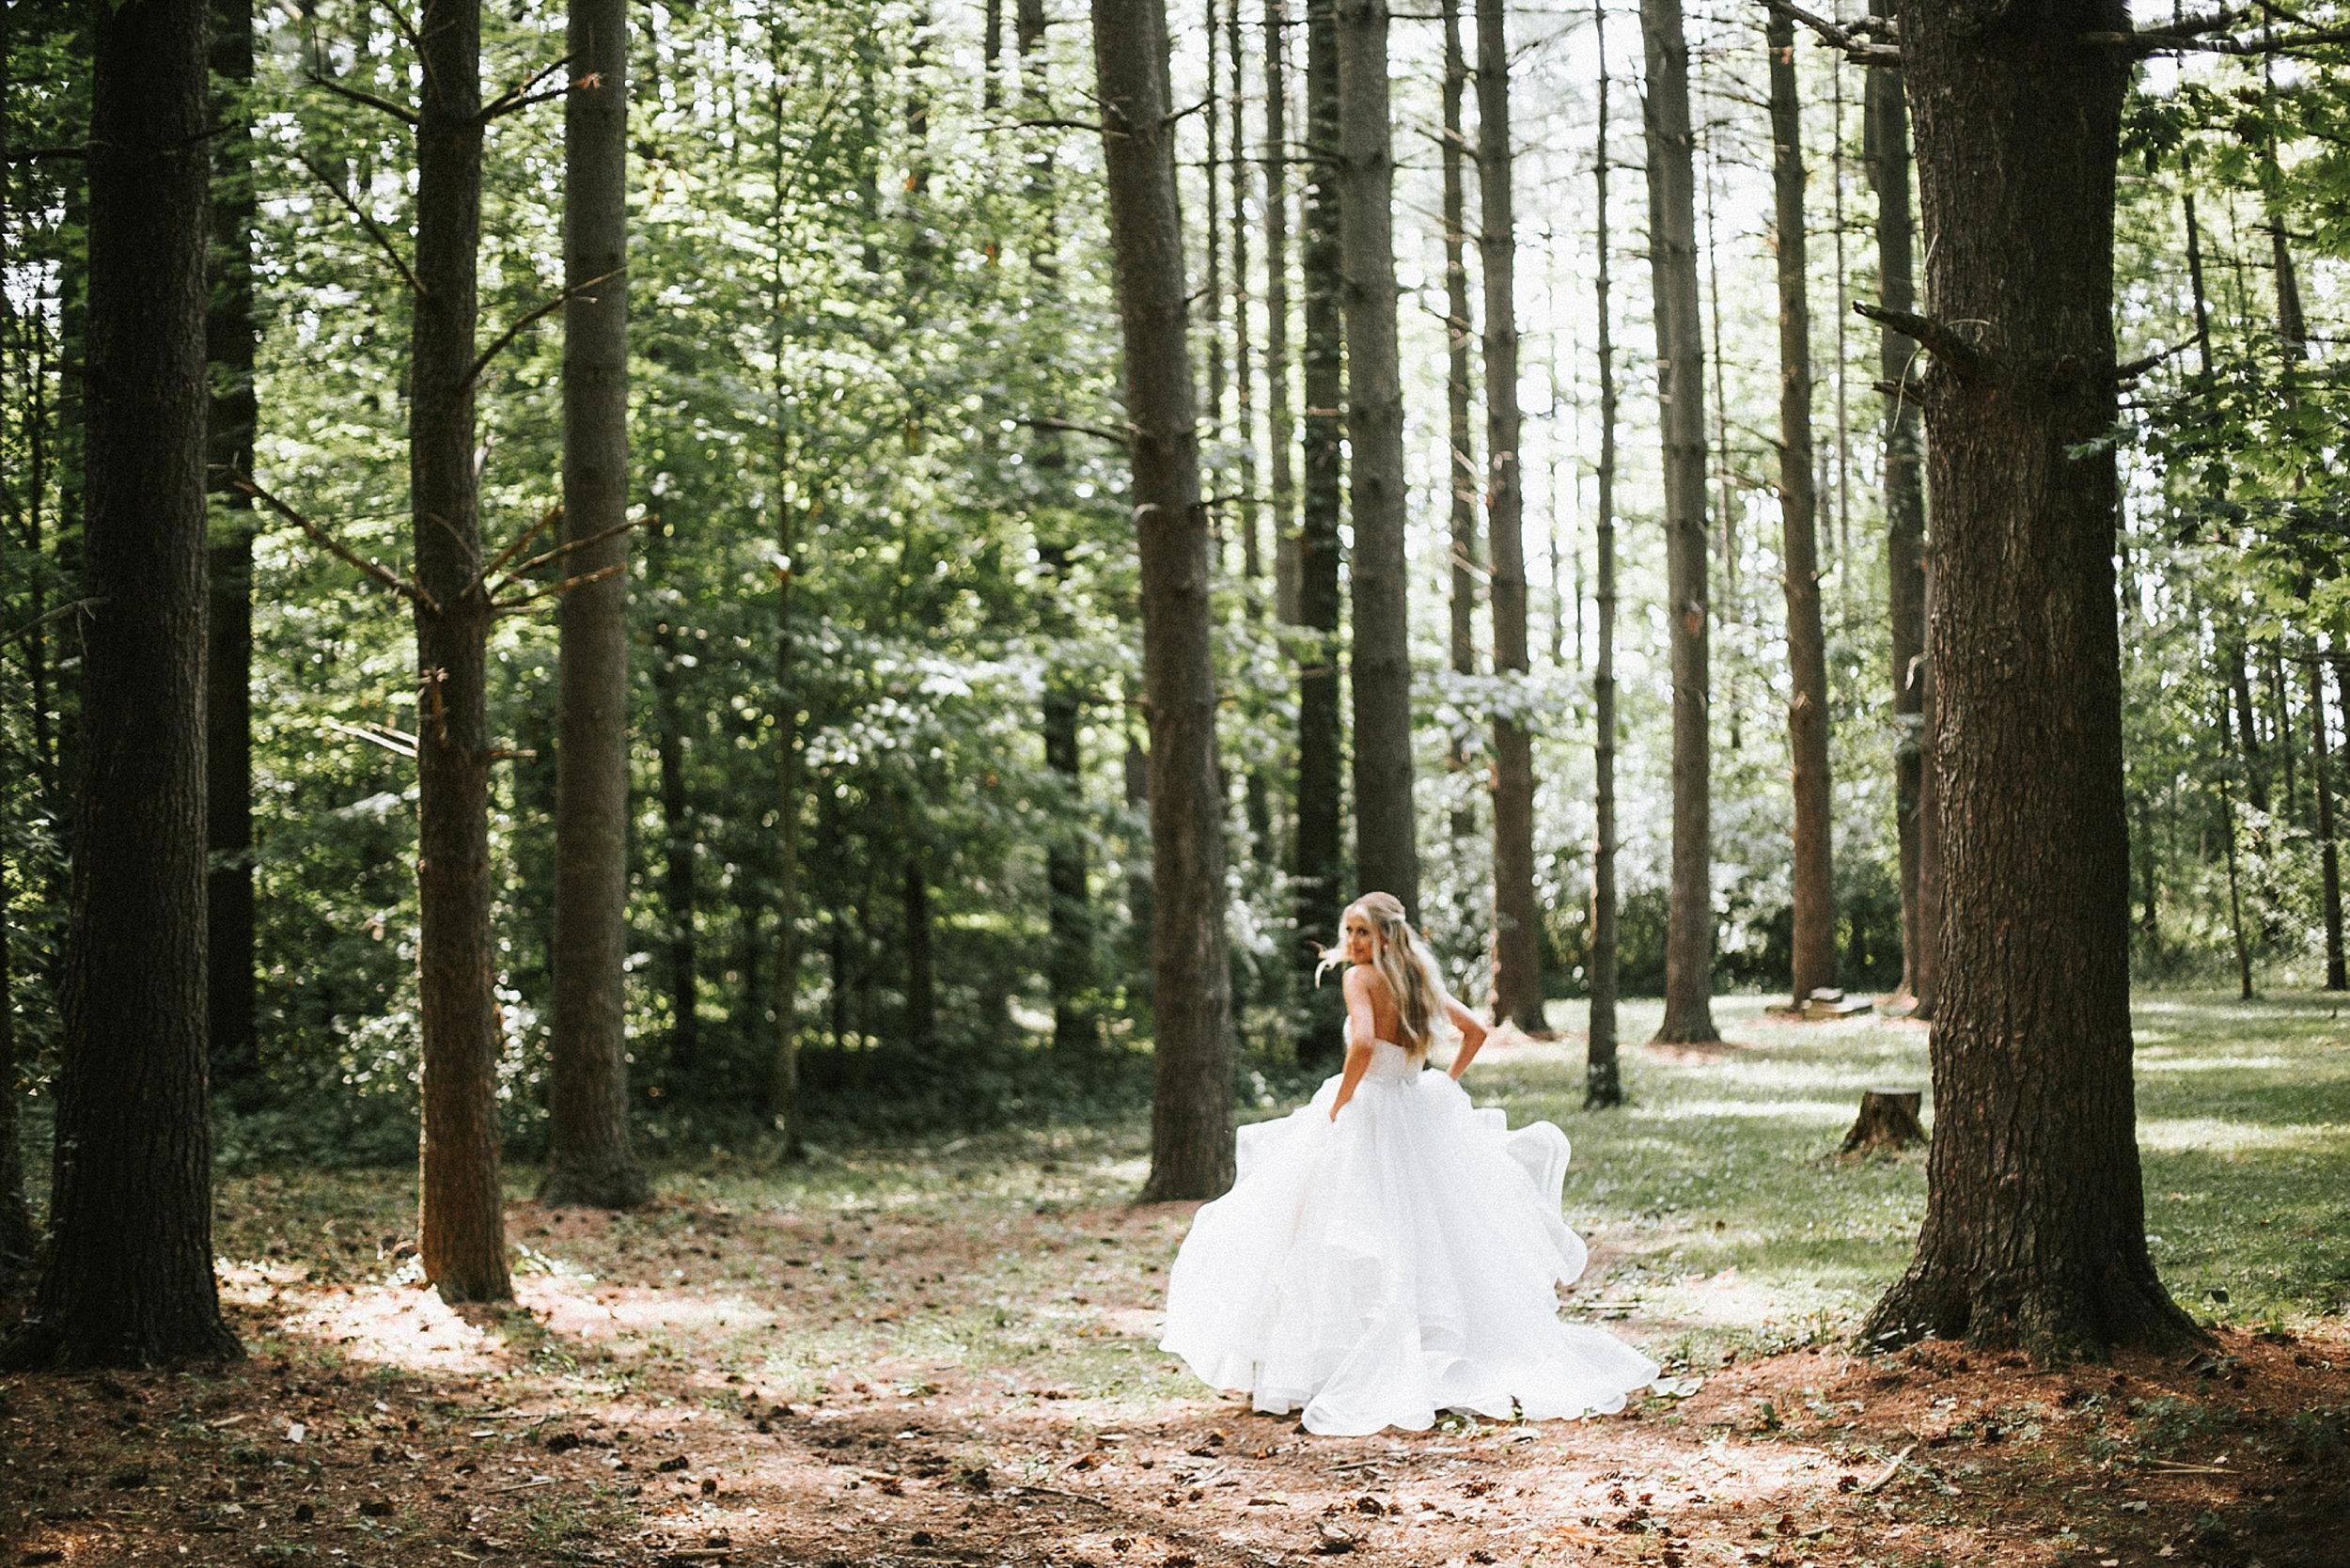 Brooke Townsend Photography - Cincinnati Wedding Photographer (33 of 153).jpg